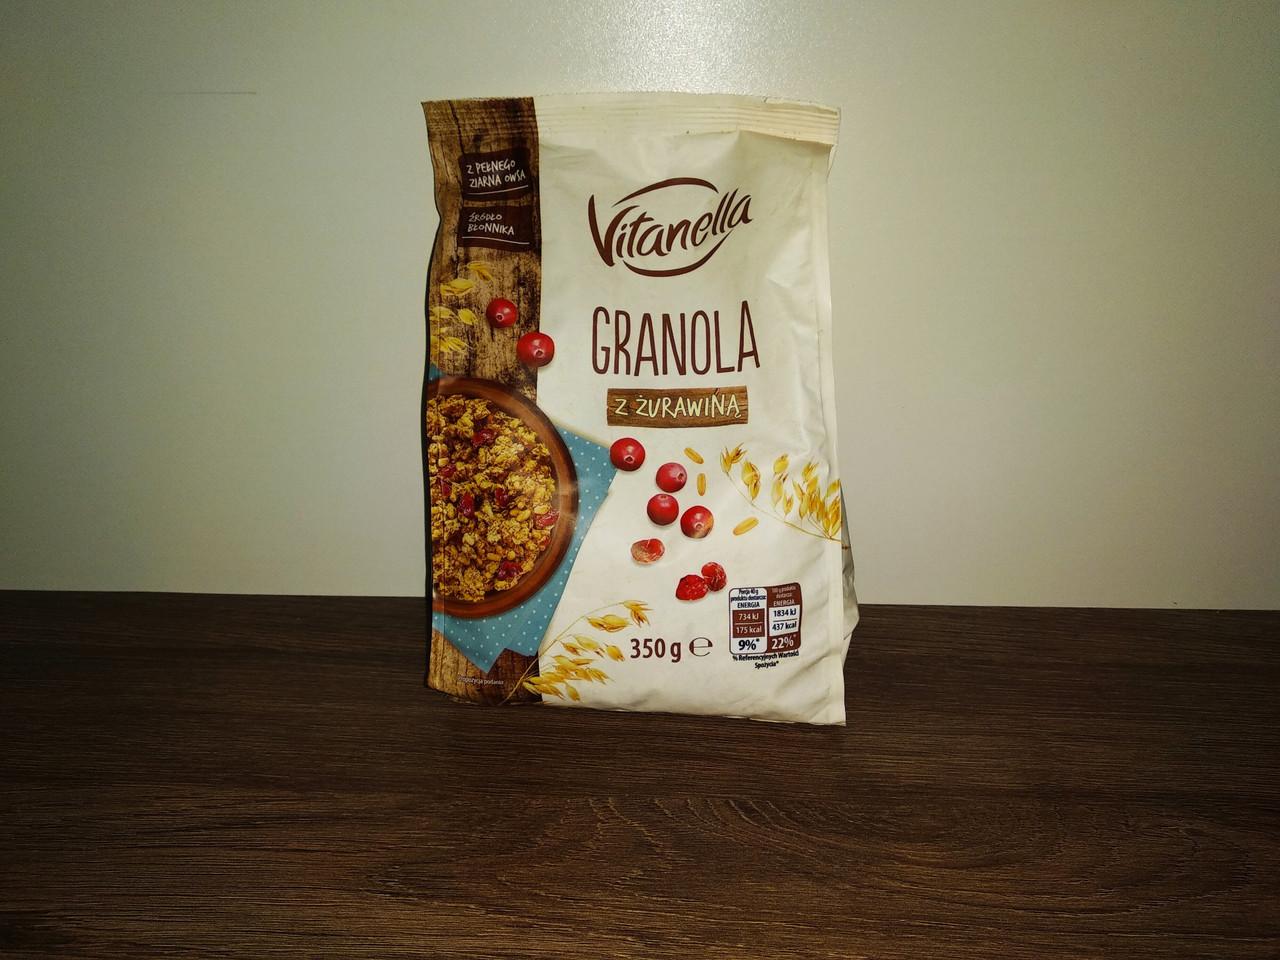 Granola Vitanella сухий сніданок (з журавлиною) 350 гр.